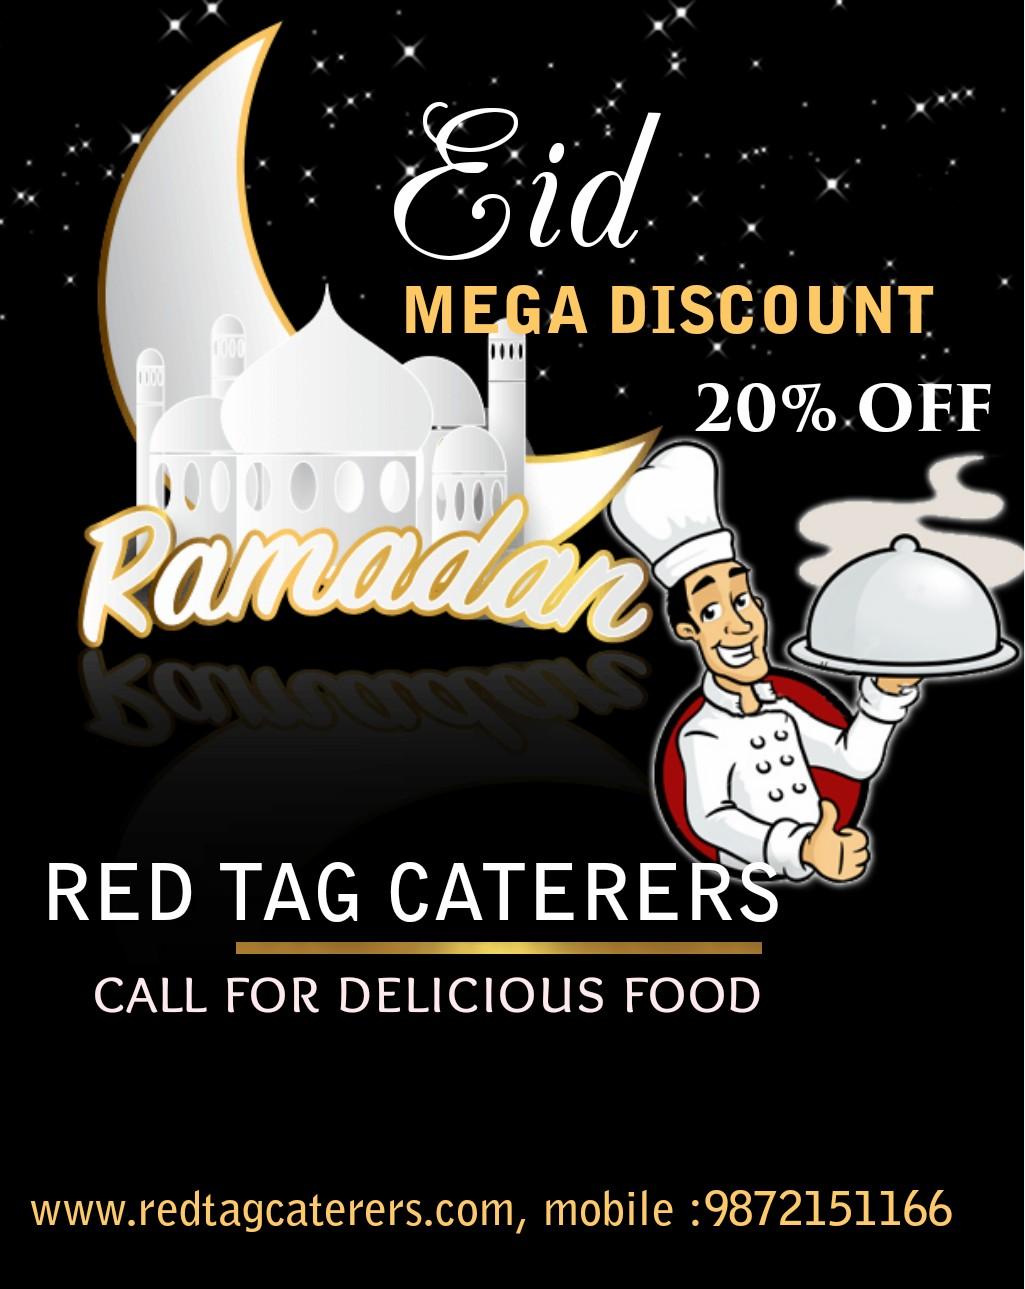 Celebrate Eid al Fitr in Chandigarh  | Red Tag Caterers | Celebrate Eid al fitr in Chandigarh,  - GL43328